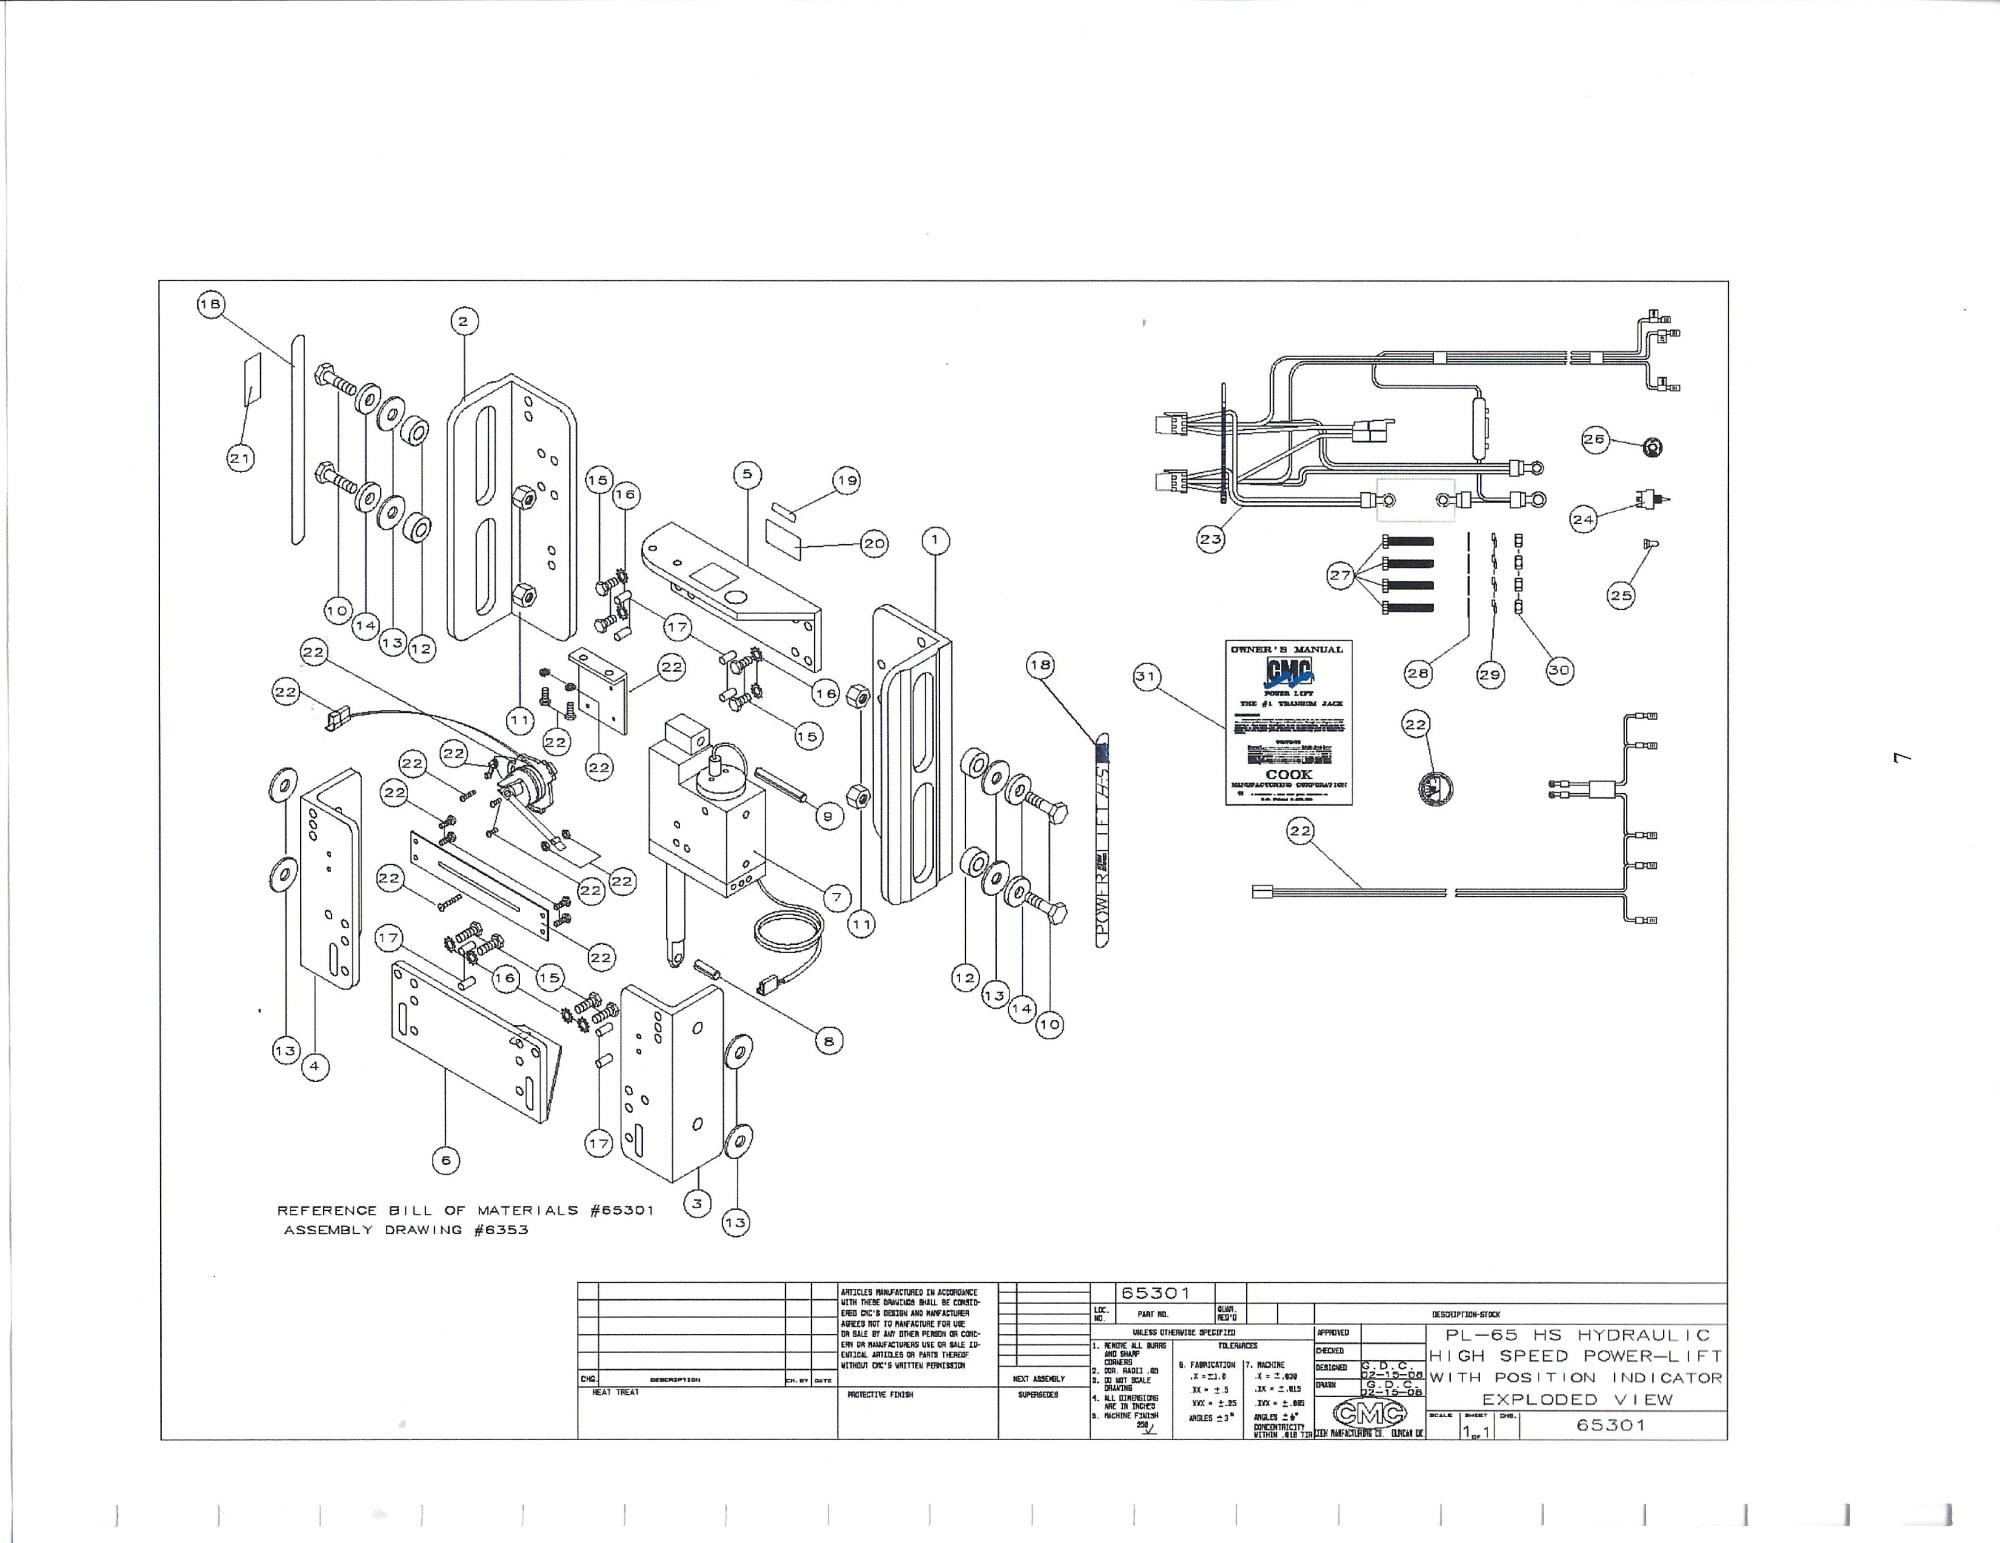 hight resolution of cmc pl 65 questionwww proboatparts com product 08 current jpg